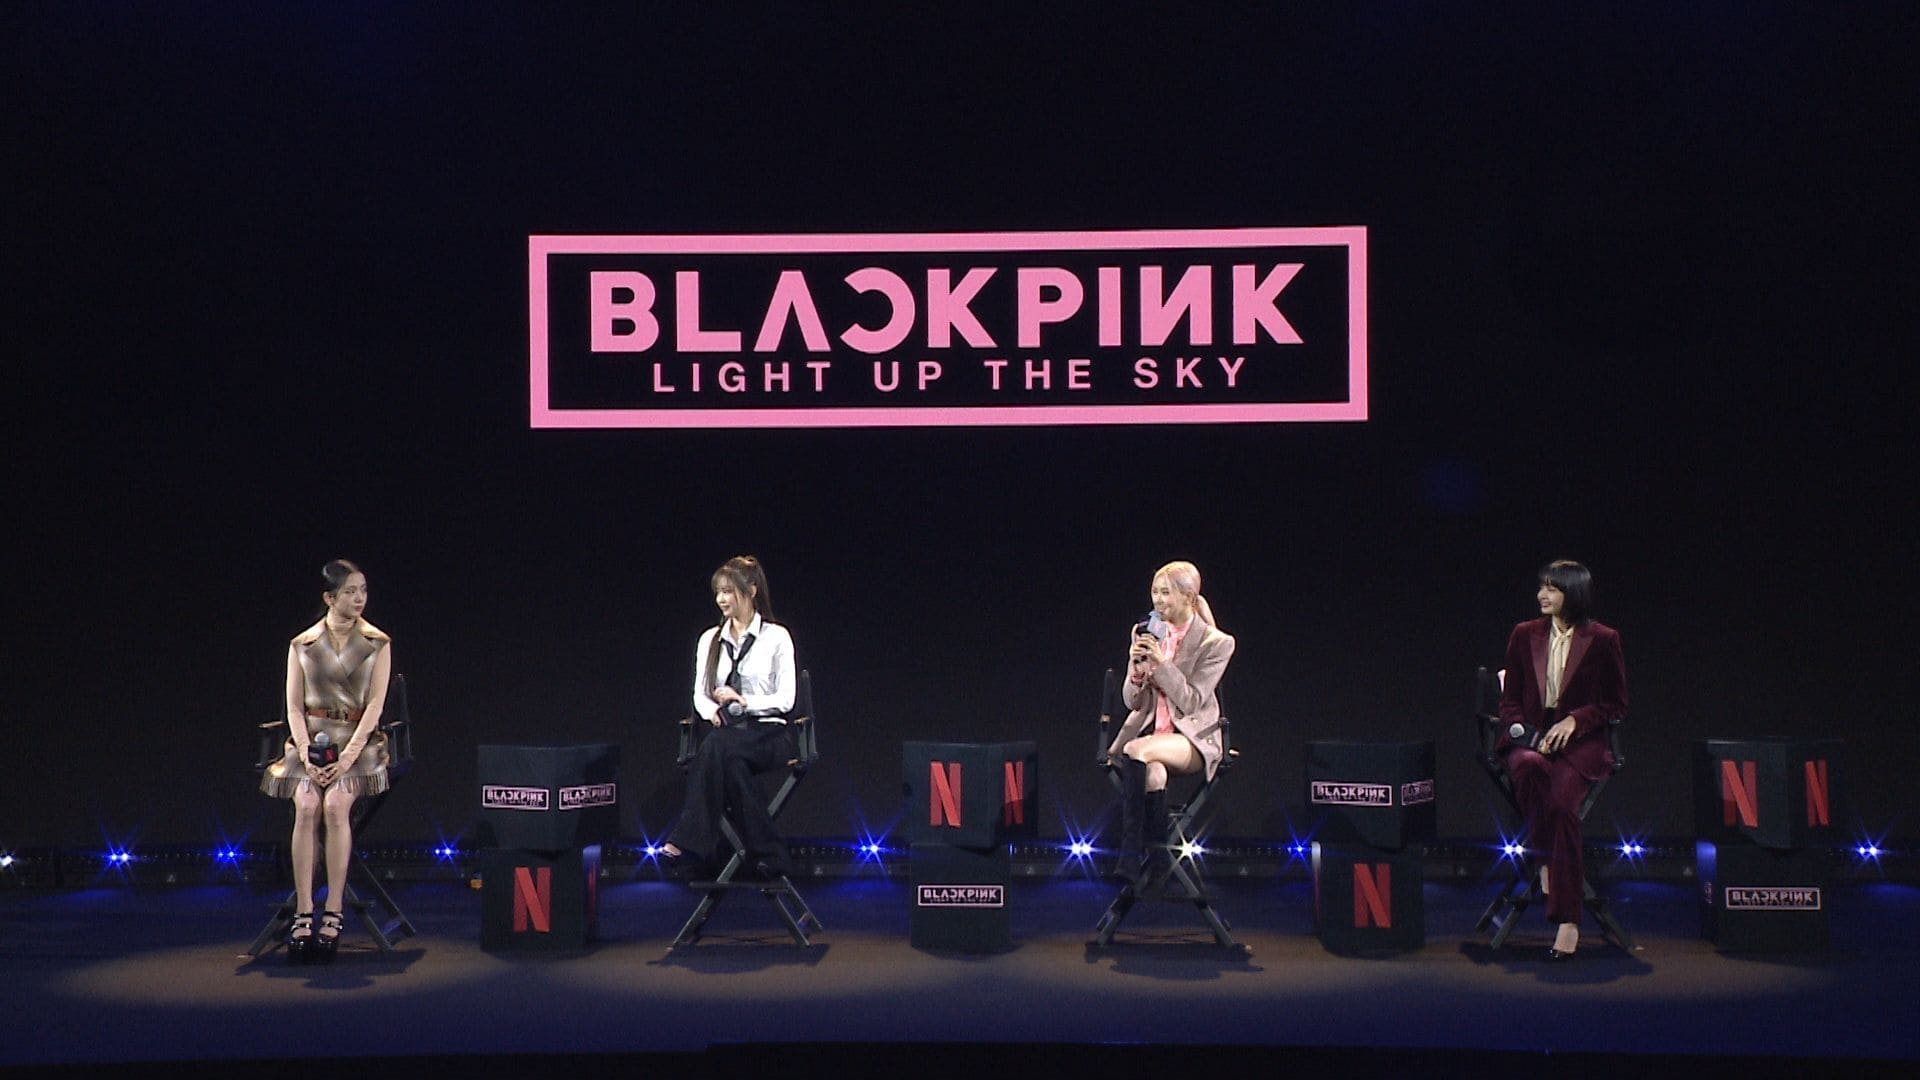 BLACKPINK: Light Up the Sky